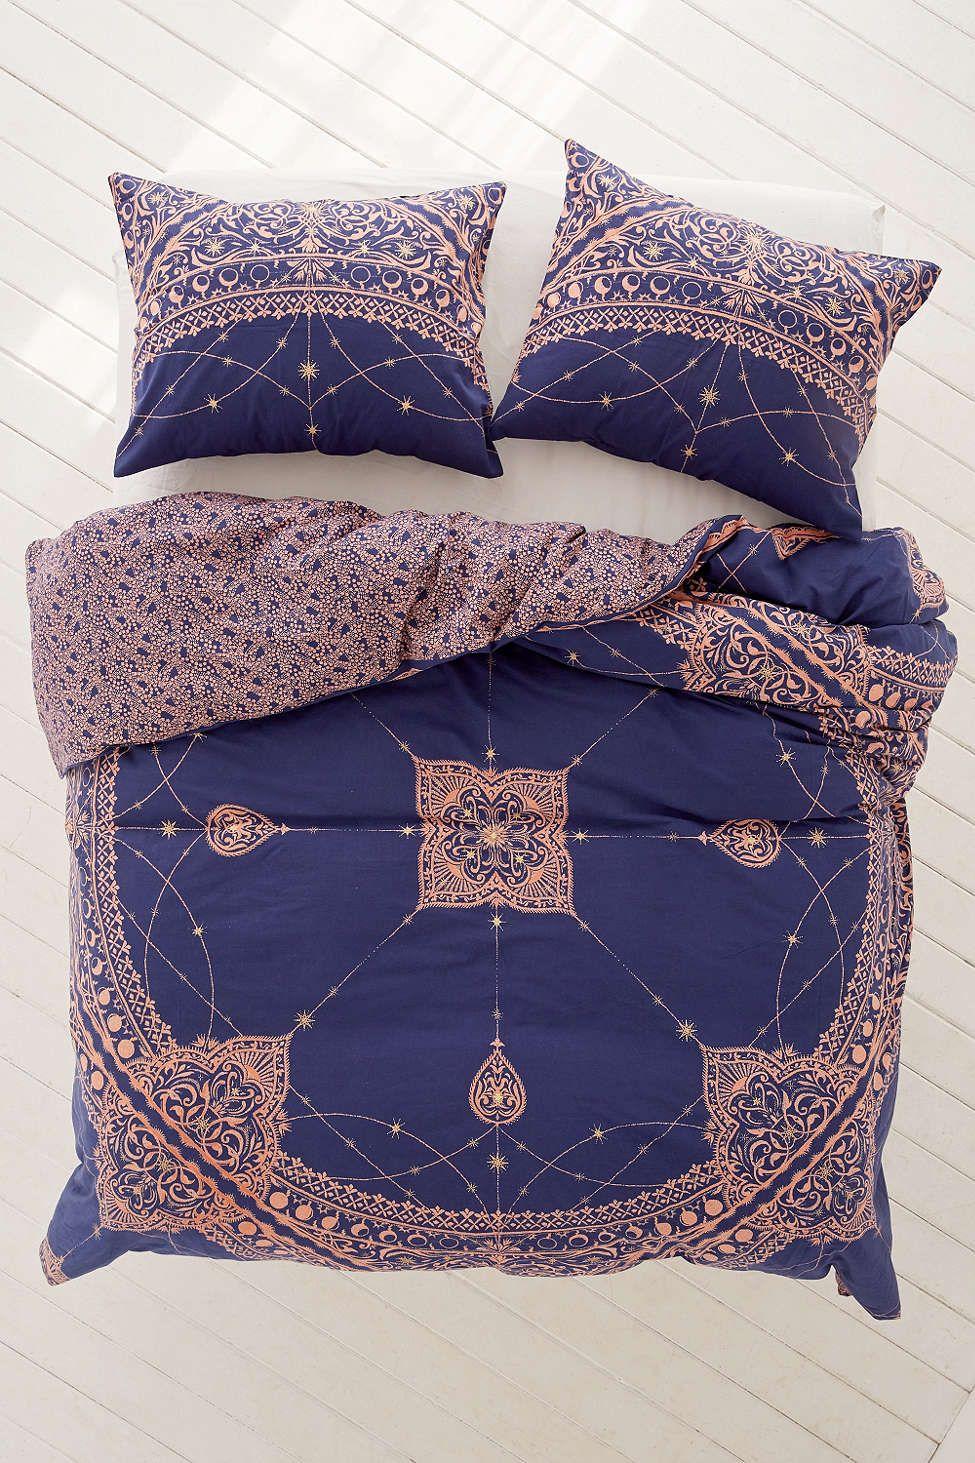 comforter bath home duvet geometric collection blue decor n covers the king bedding celestial naples decorators b depot queen